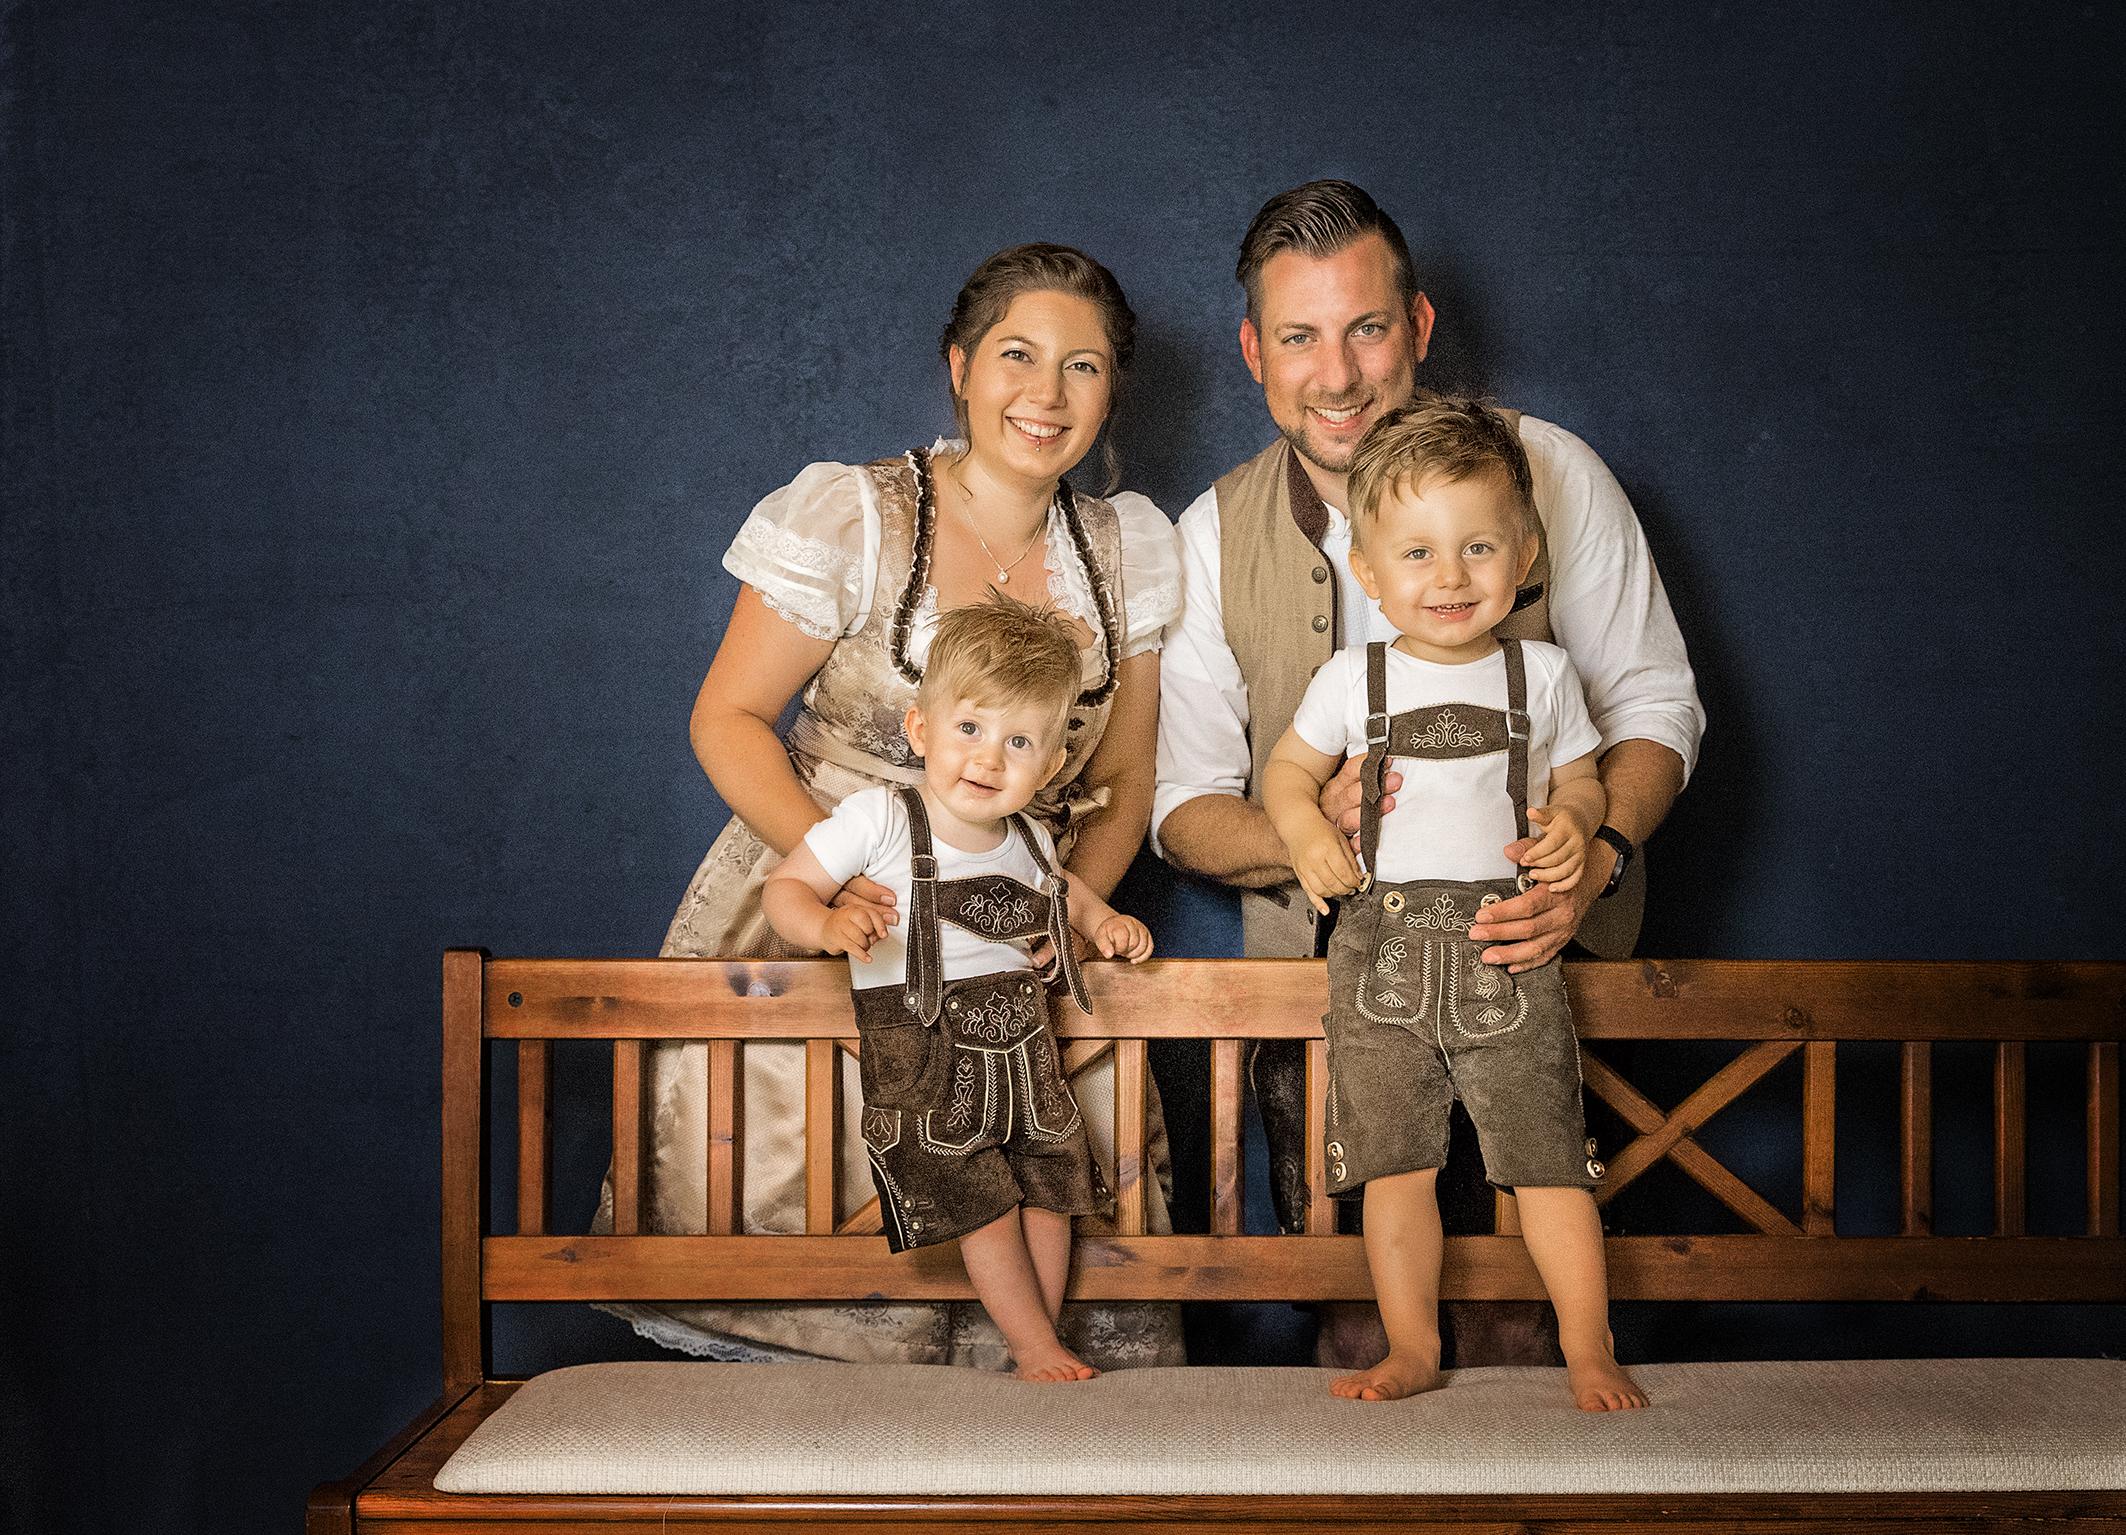 Familienfoto Portraitbilder im Fotostudio